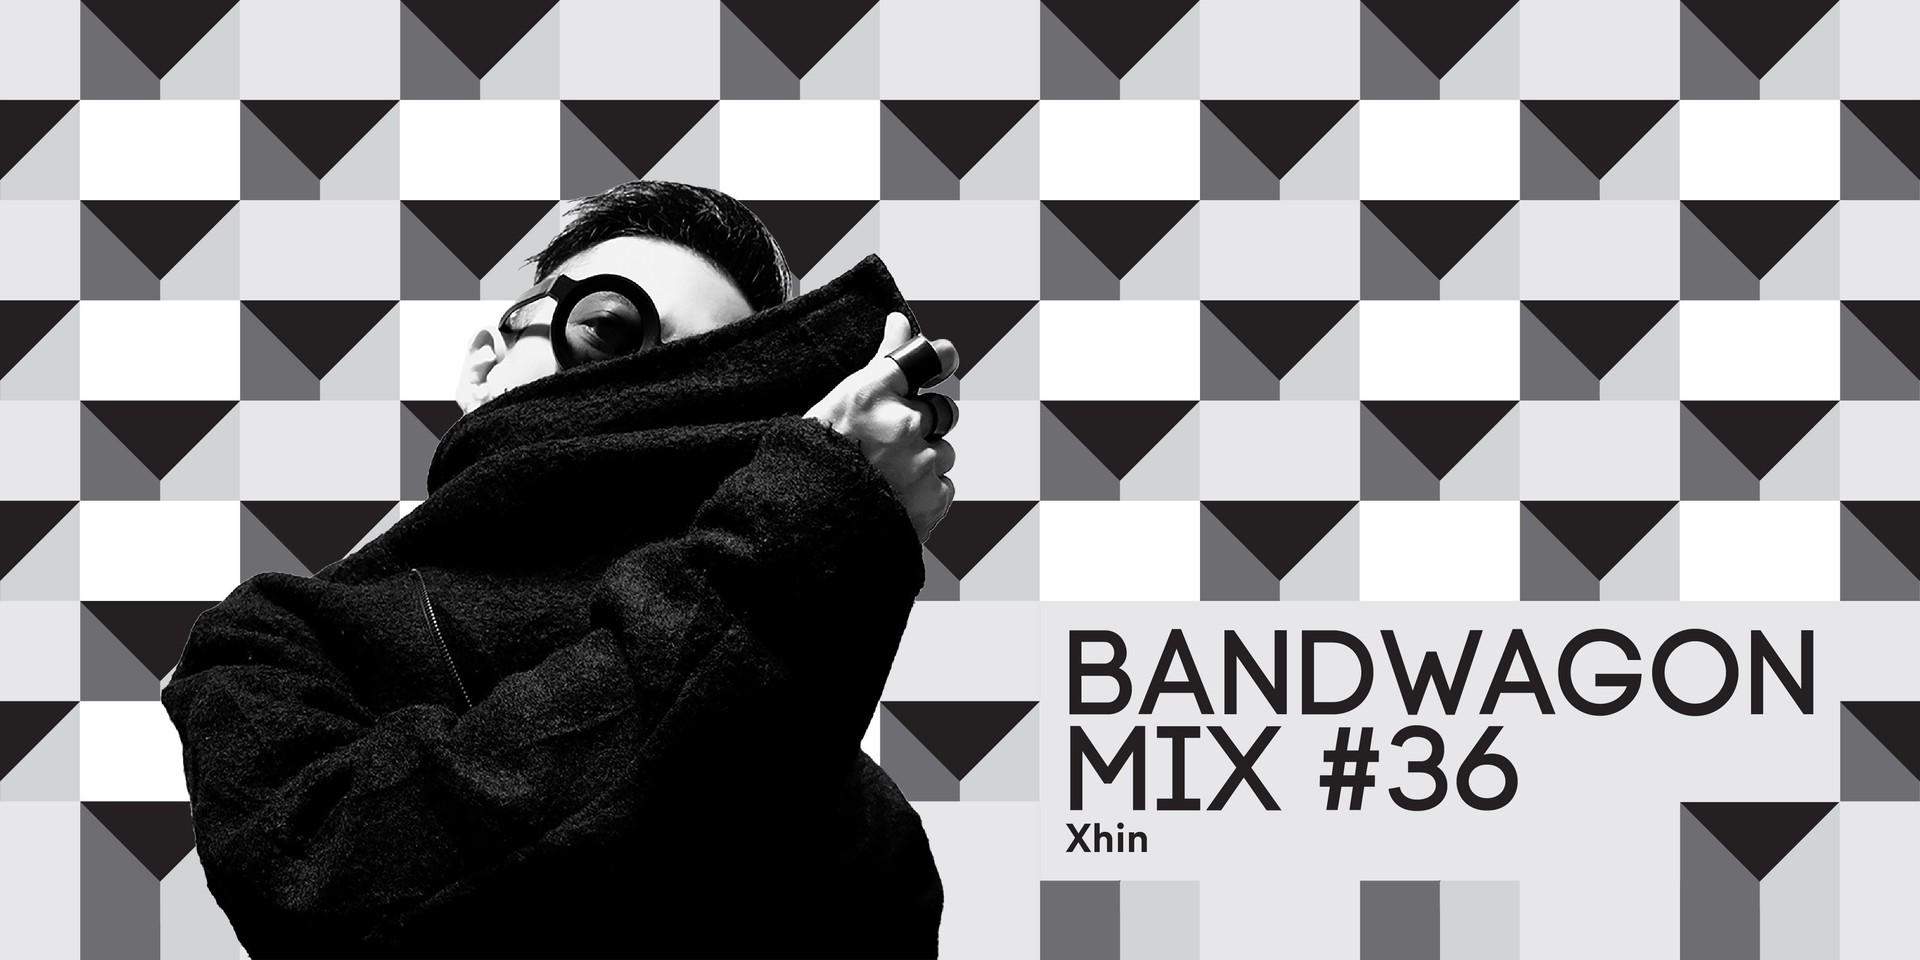 Bandwagon Mix #36: Xhin